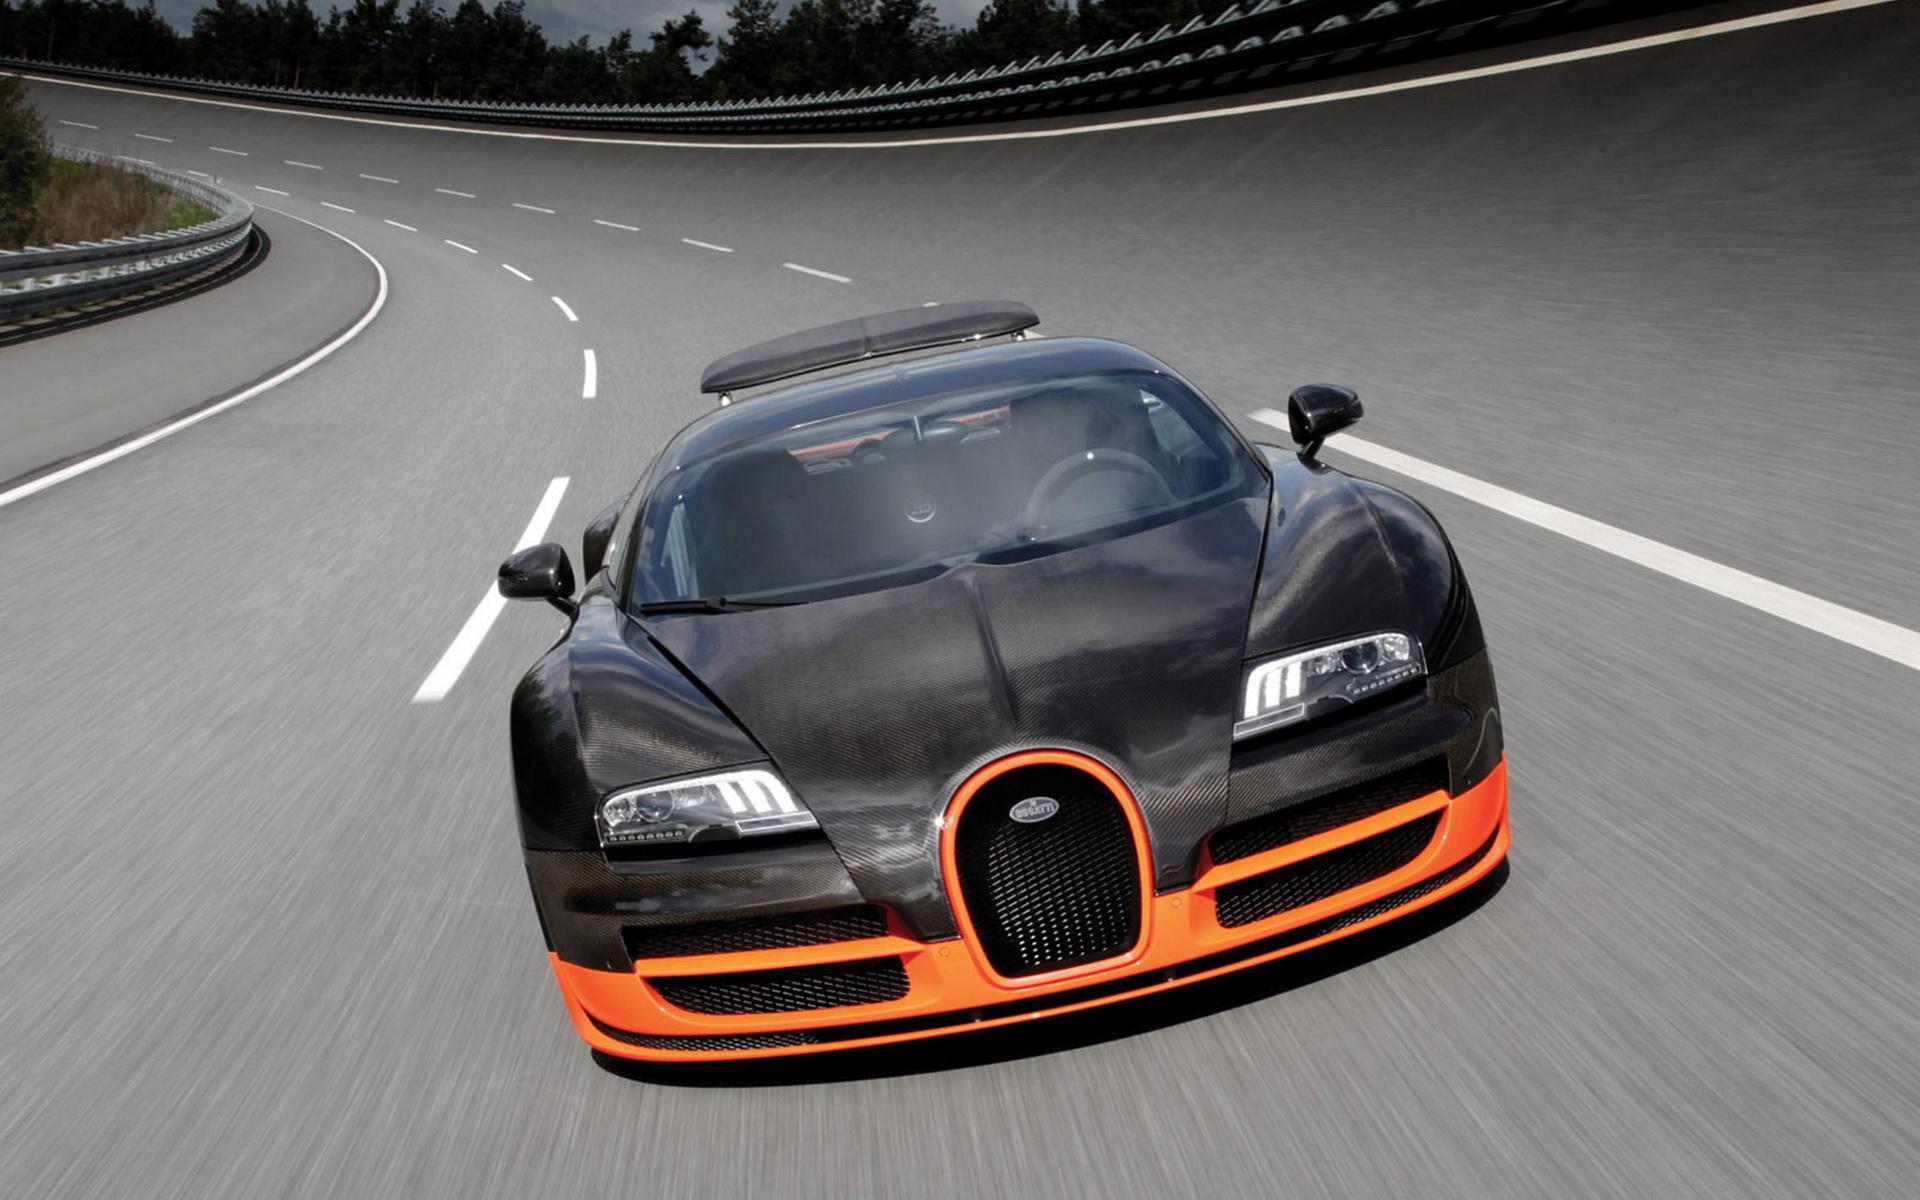 Bugatti_Veyron_SS Stunning Bugatti Veyron Super Sport White Cars Trend